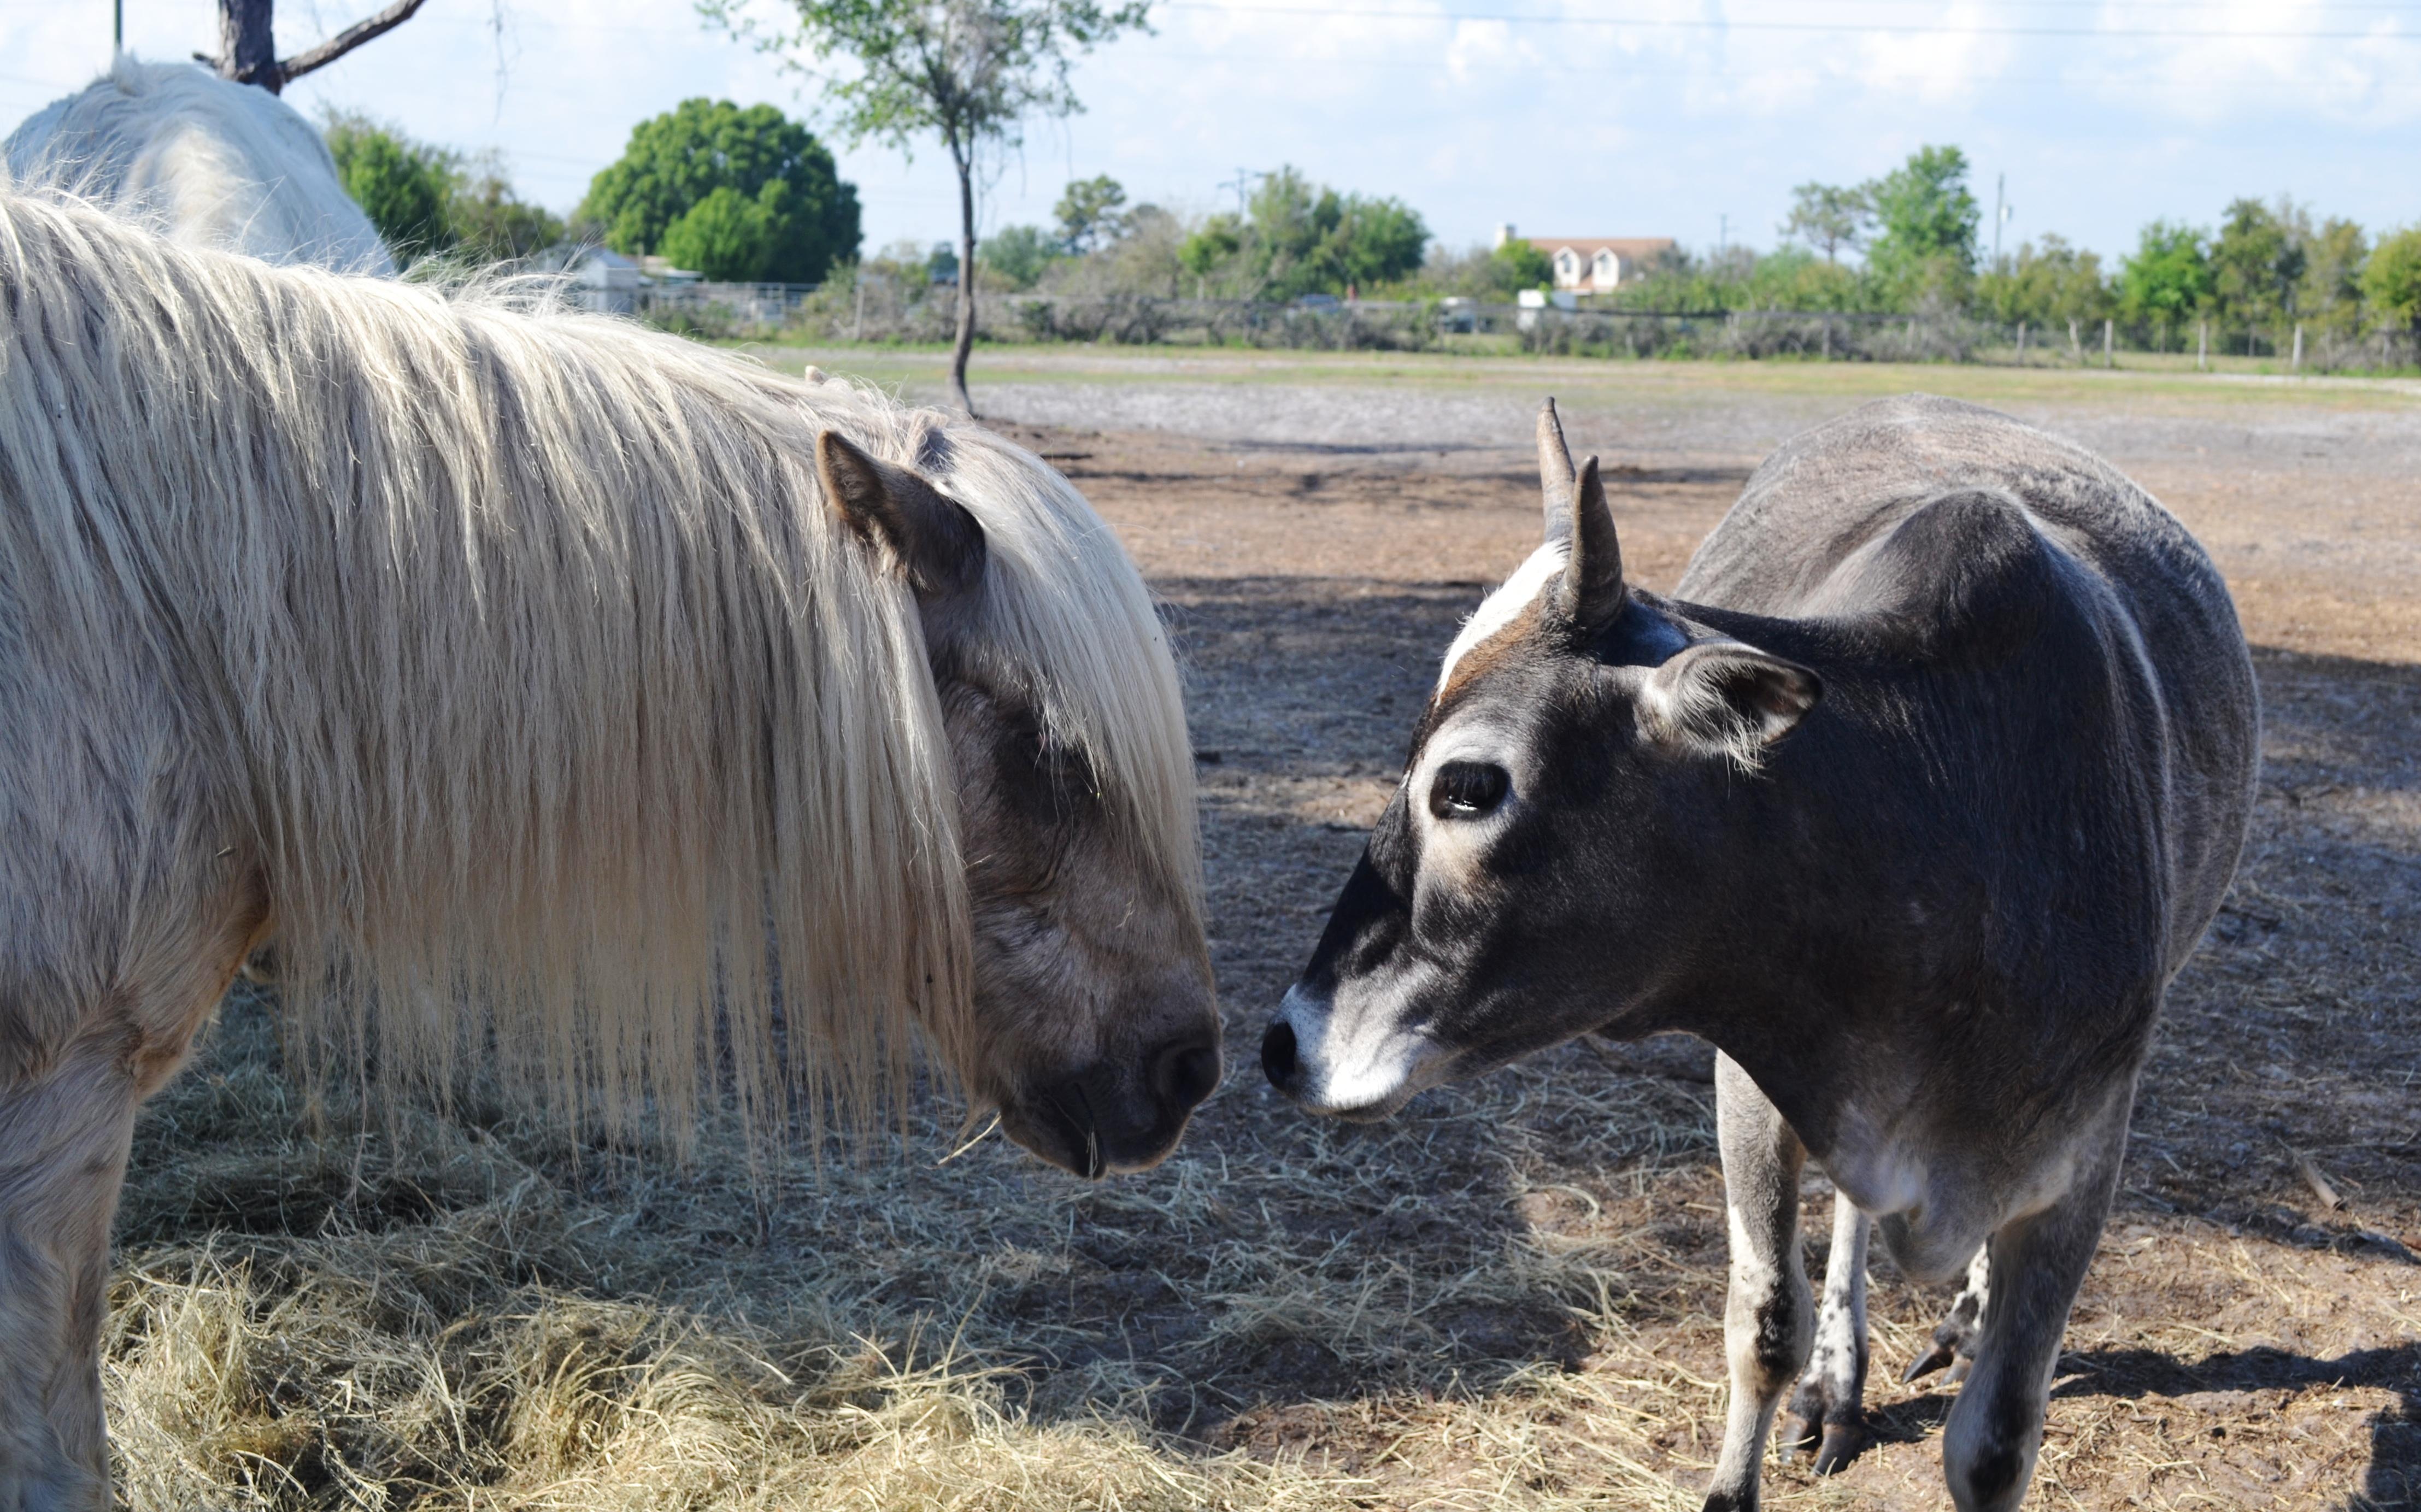 Moo and pony